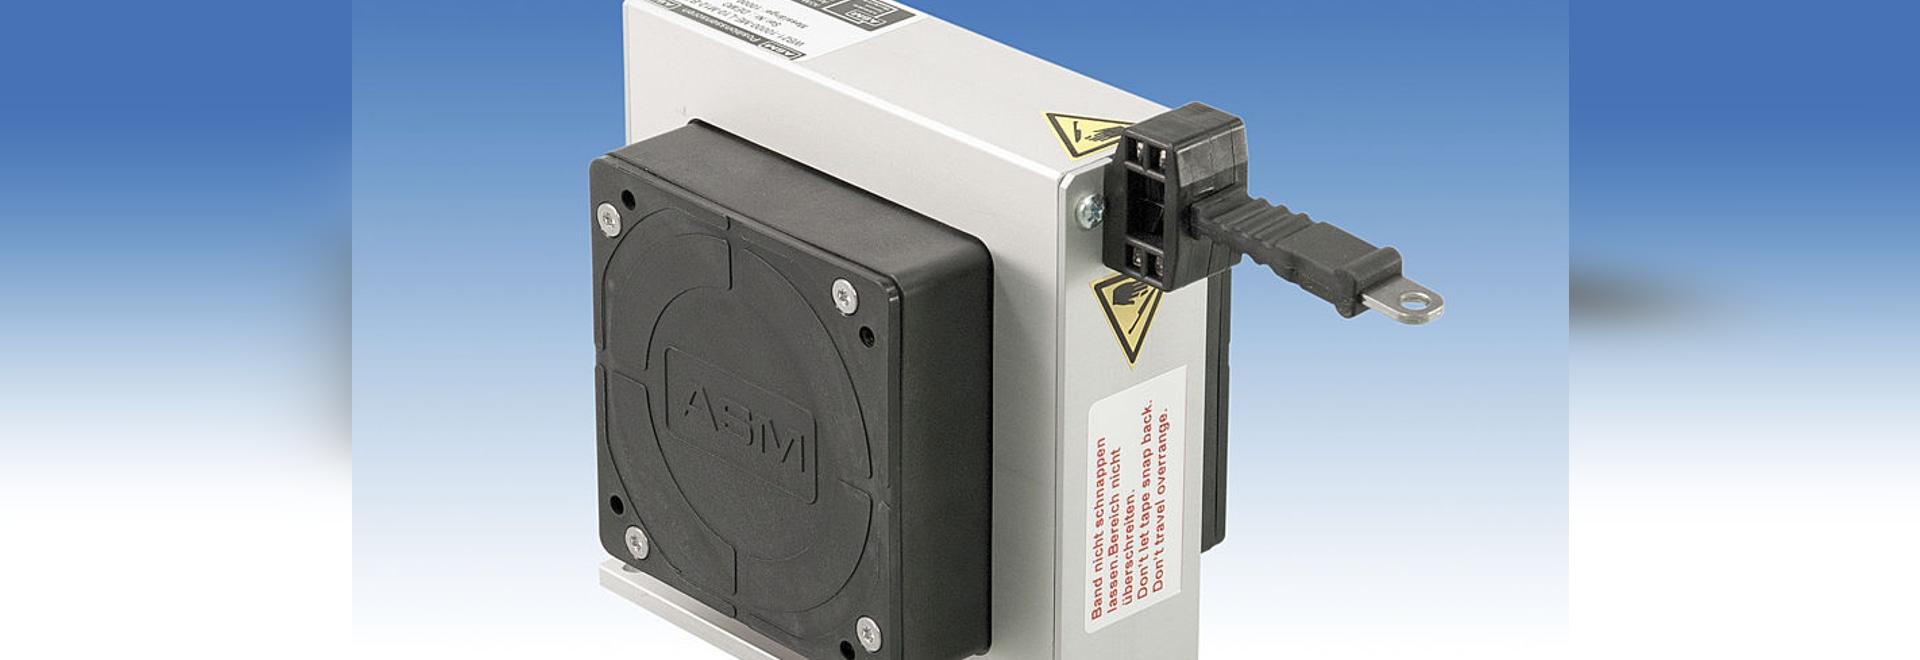 Product catalogue TAPE extension position sensors